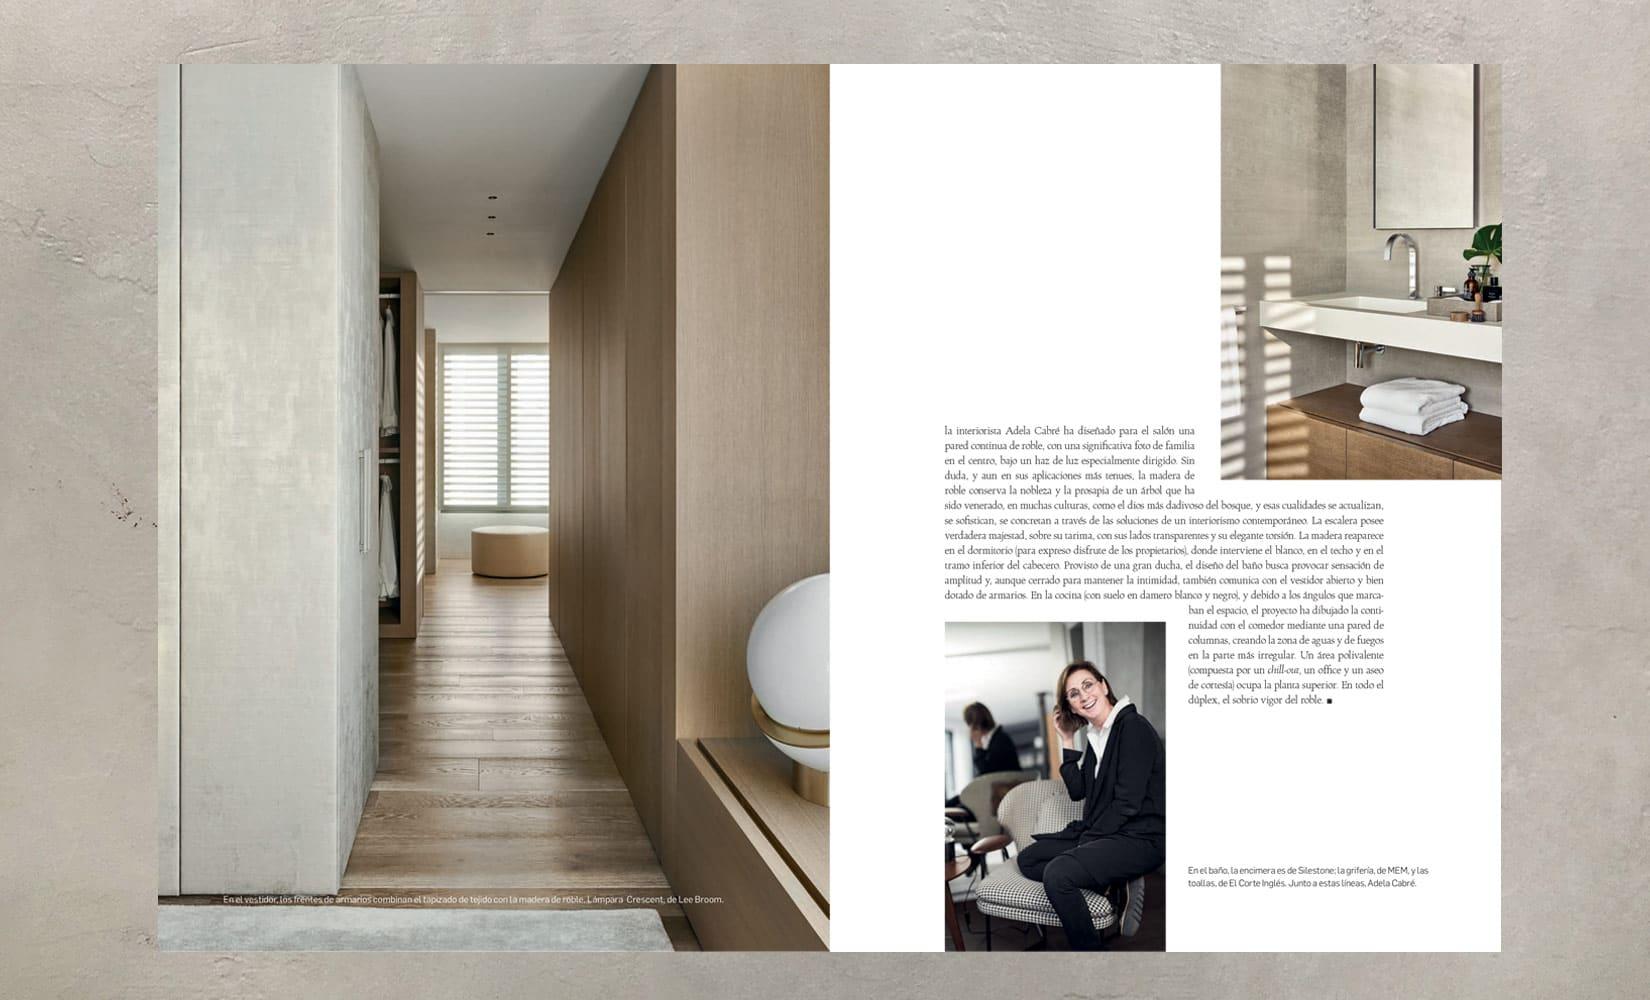 https://www.adelacabre.com/wp-content/uploads/2020/12/arquitectura-y-diseno-junio-2019-06.jpg